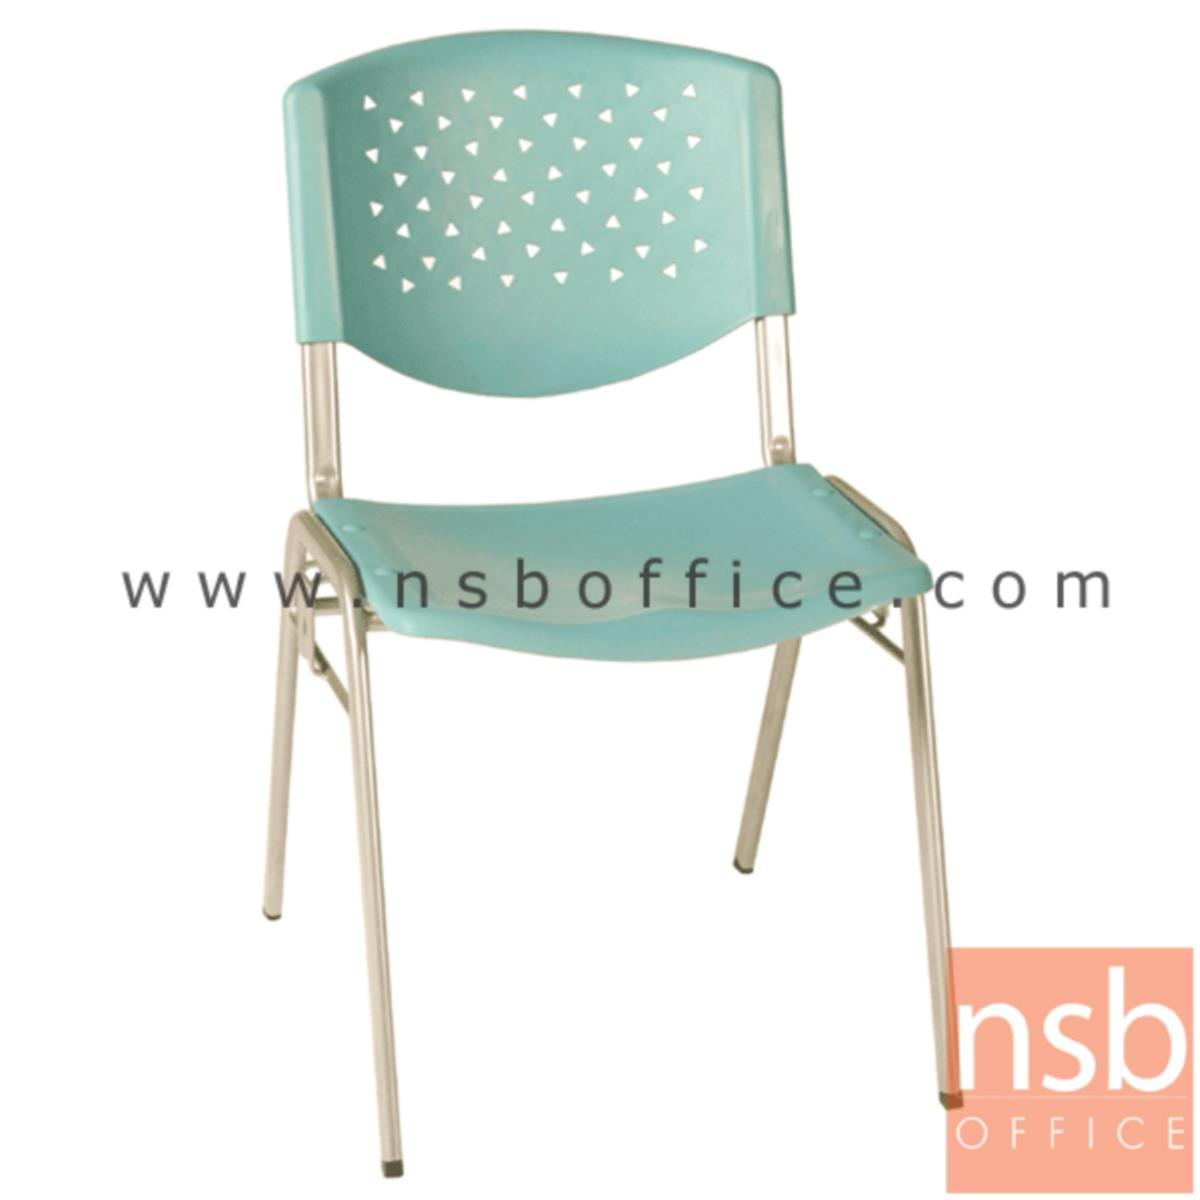 B05A041:เก้าอี้อเนกประสงค์เฟรมโพลี่ รุ่น A236-626  ขาเหล็ก